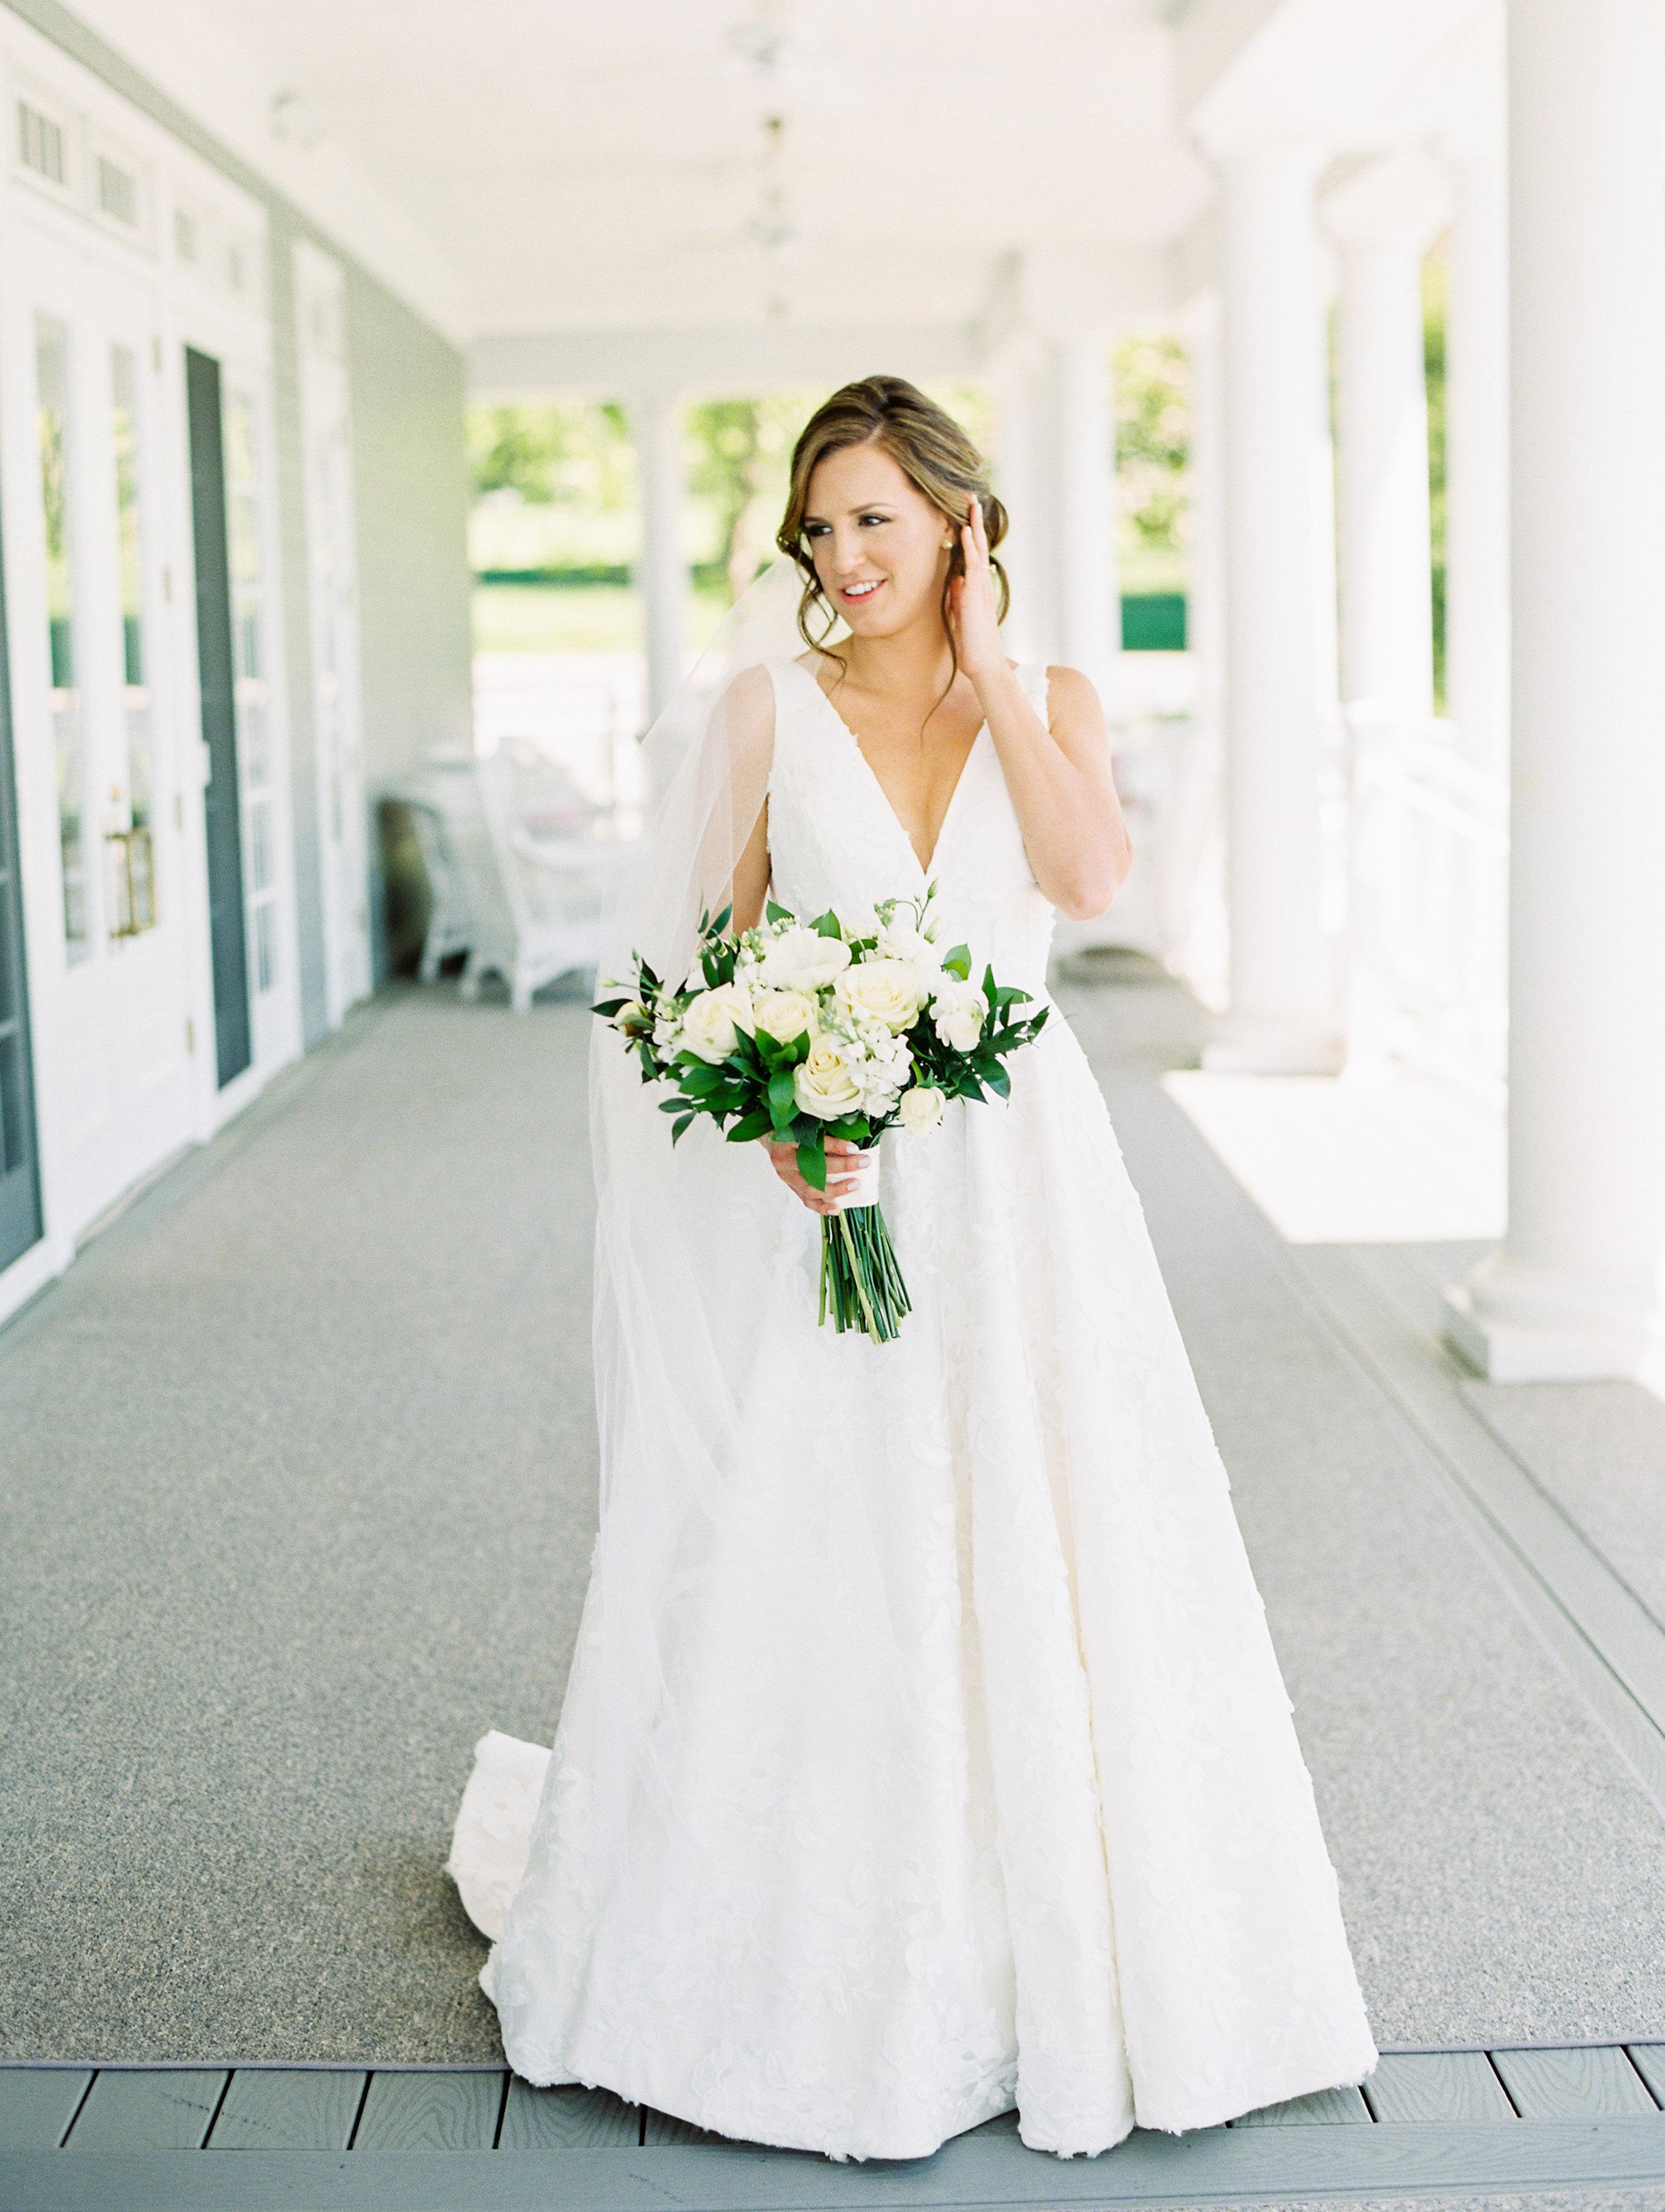 DeGuilio+Wedding+First+Lookf-8 copy.jpg